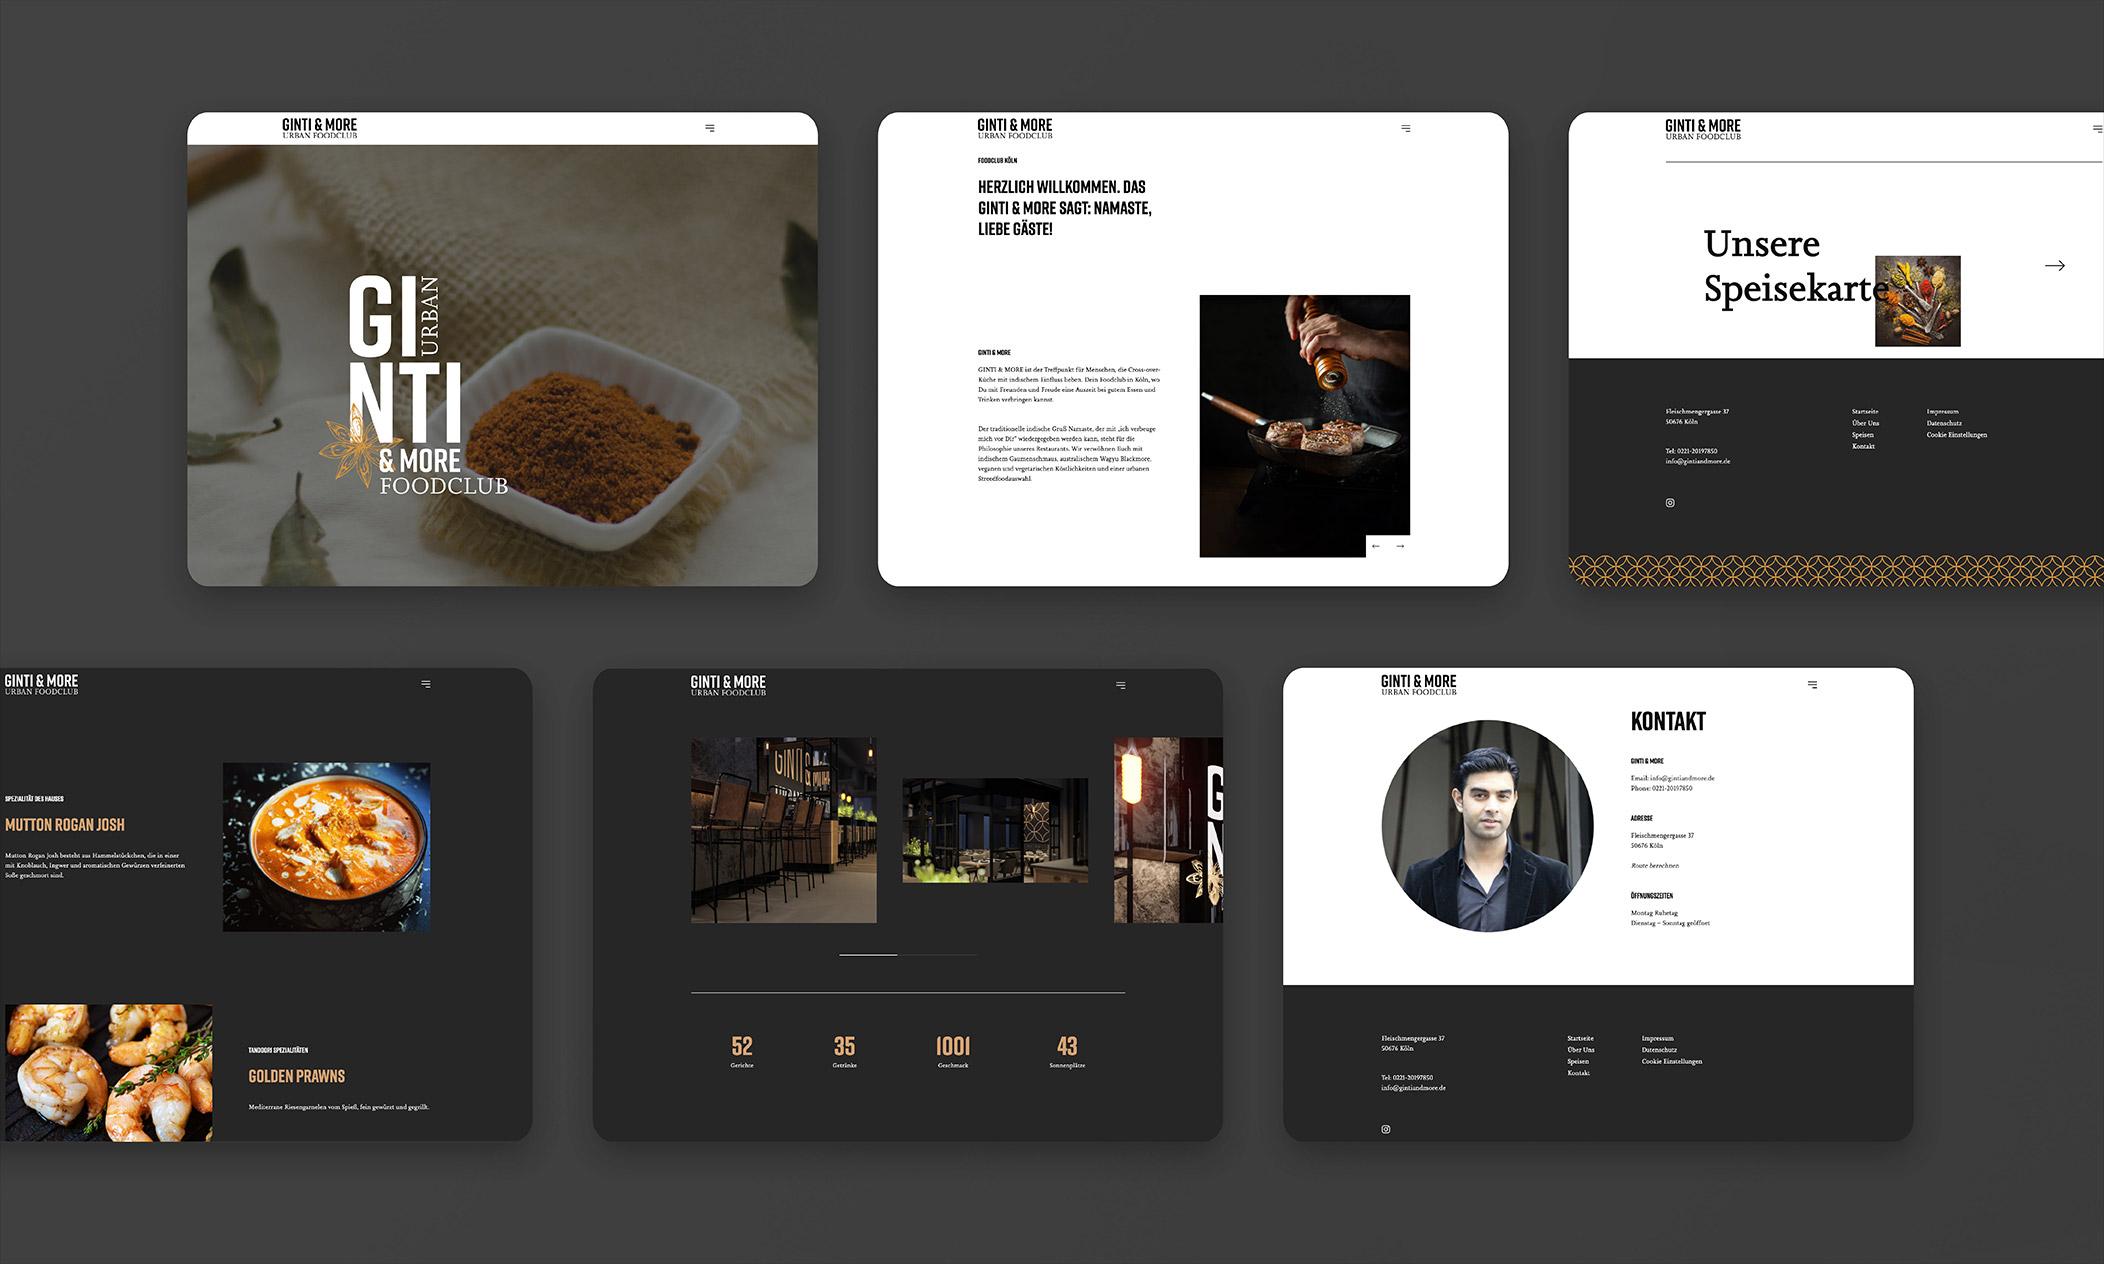 ginti_website_layout_restaurant_teamlemke_2104x1264